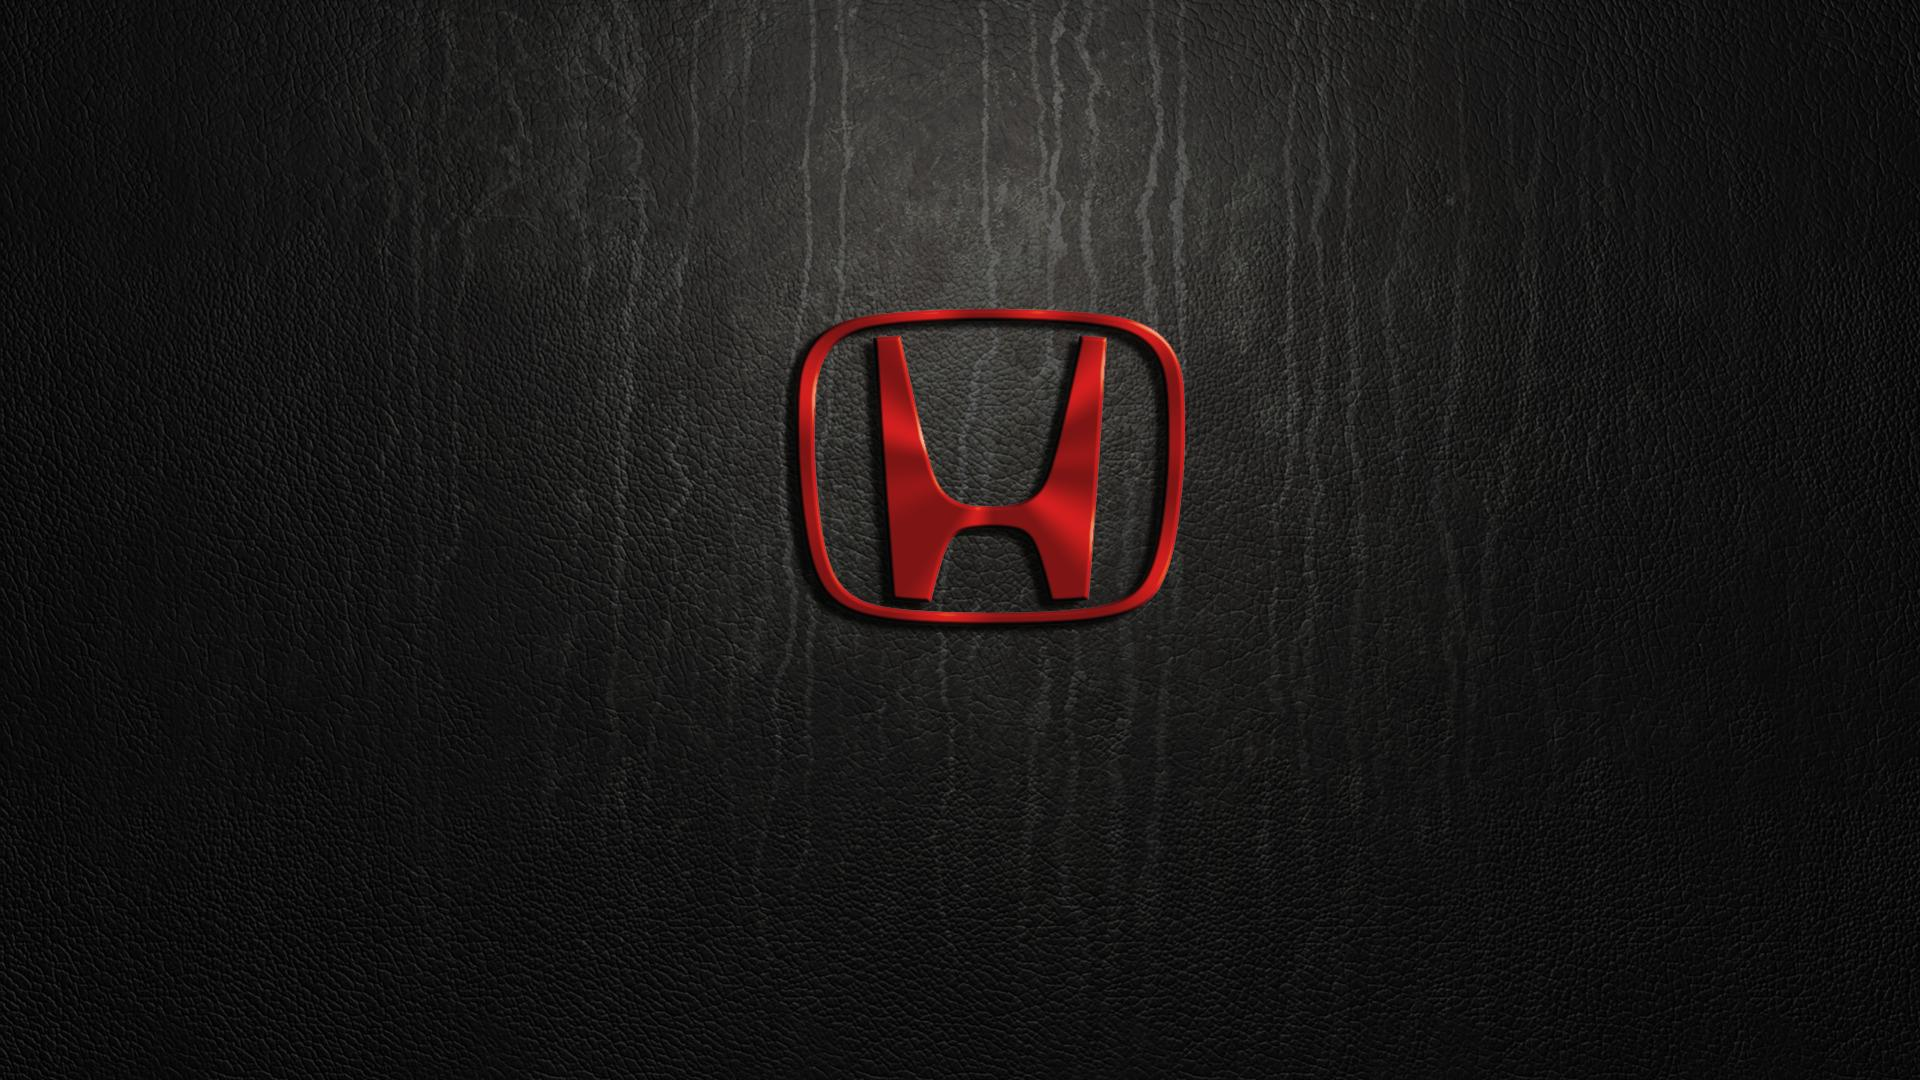 Honda Wallpaper Logo Cars Wallpapers HD - Wallpapers HD